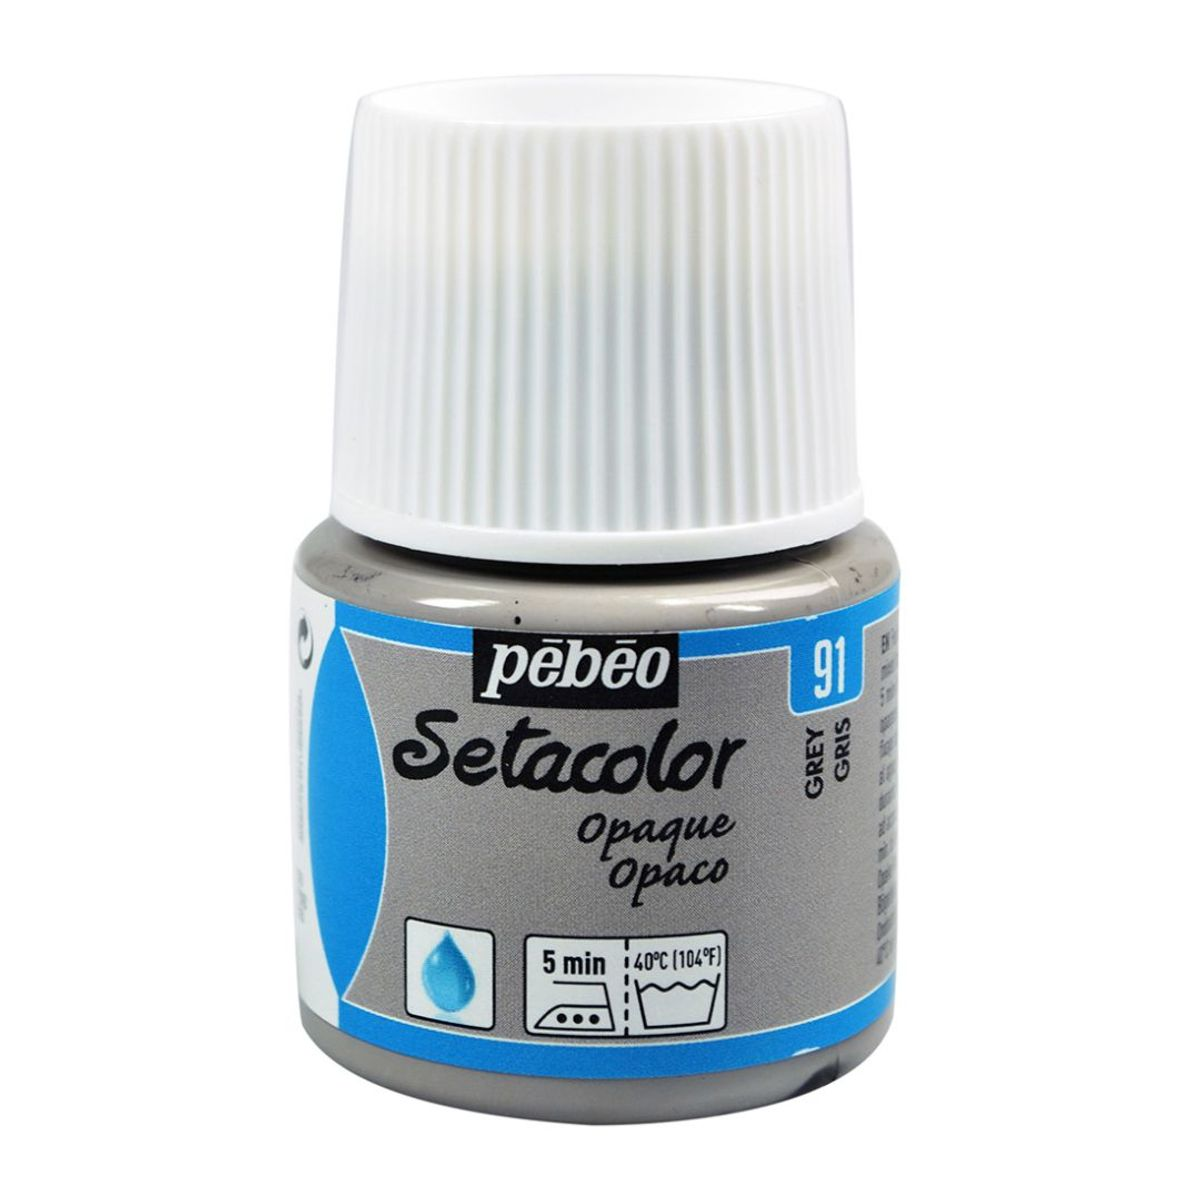 pebeo setacolor fabric paint instructions